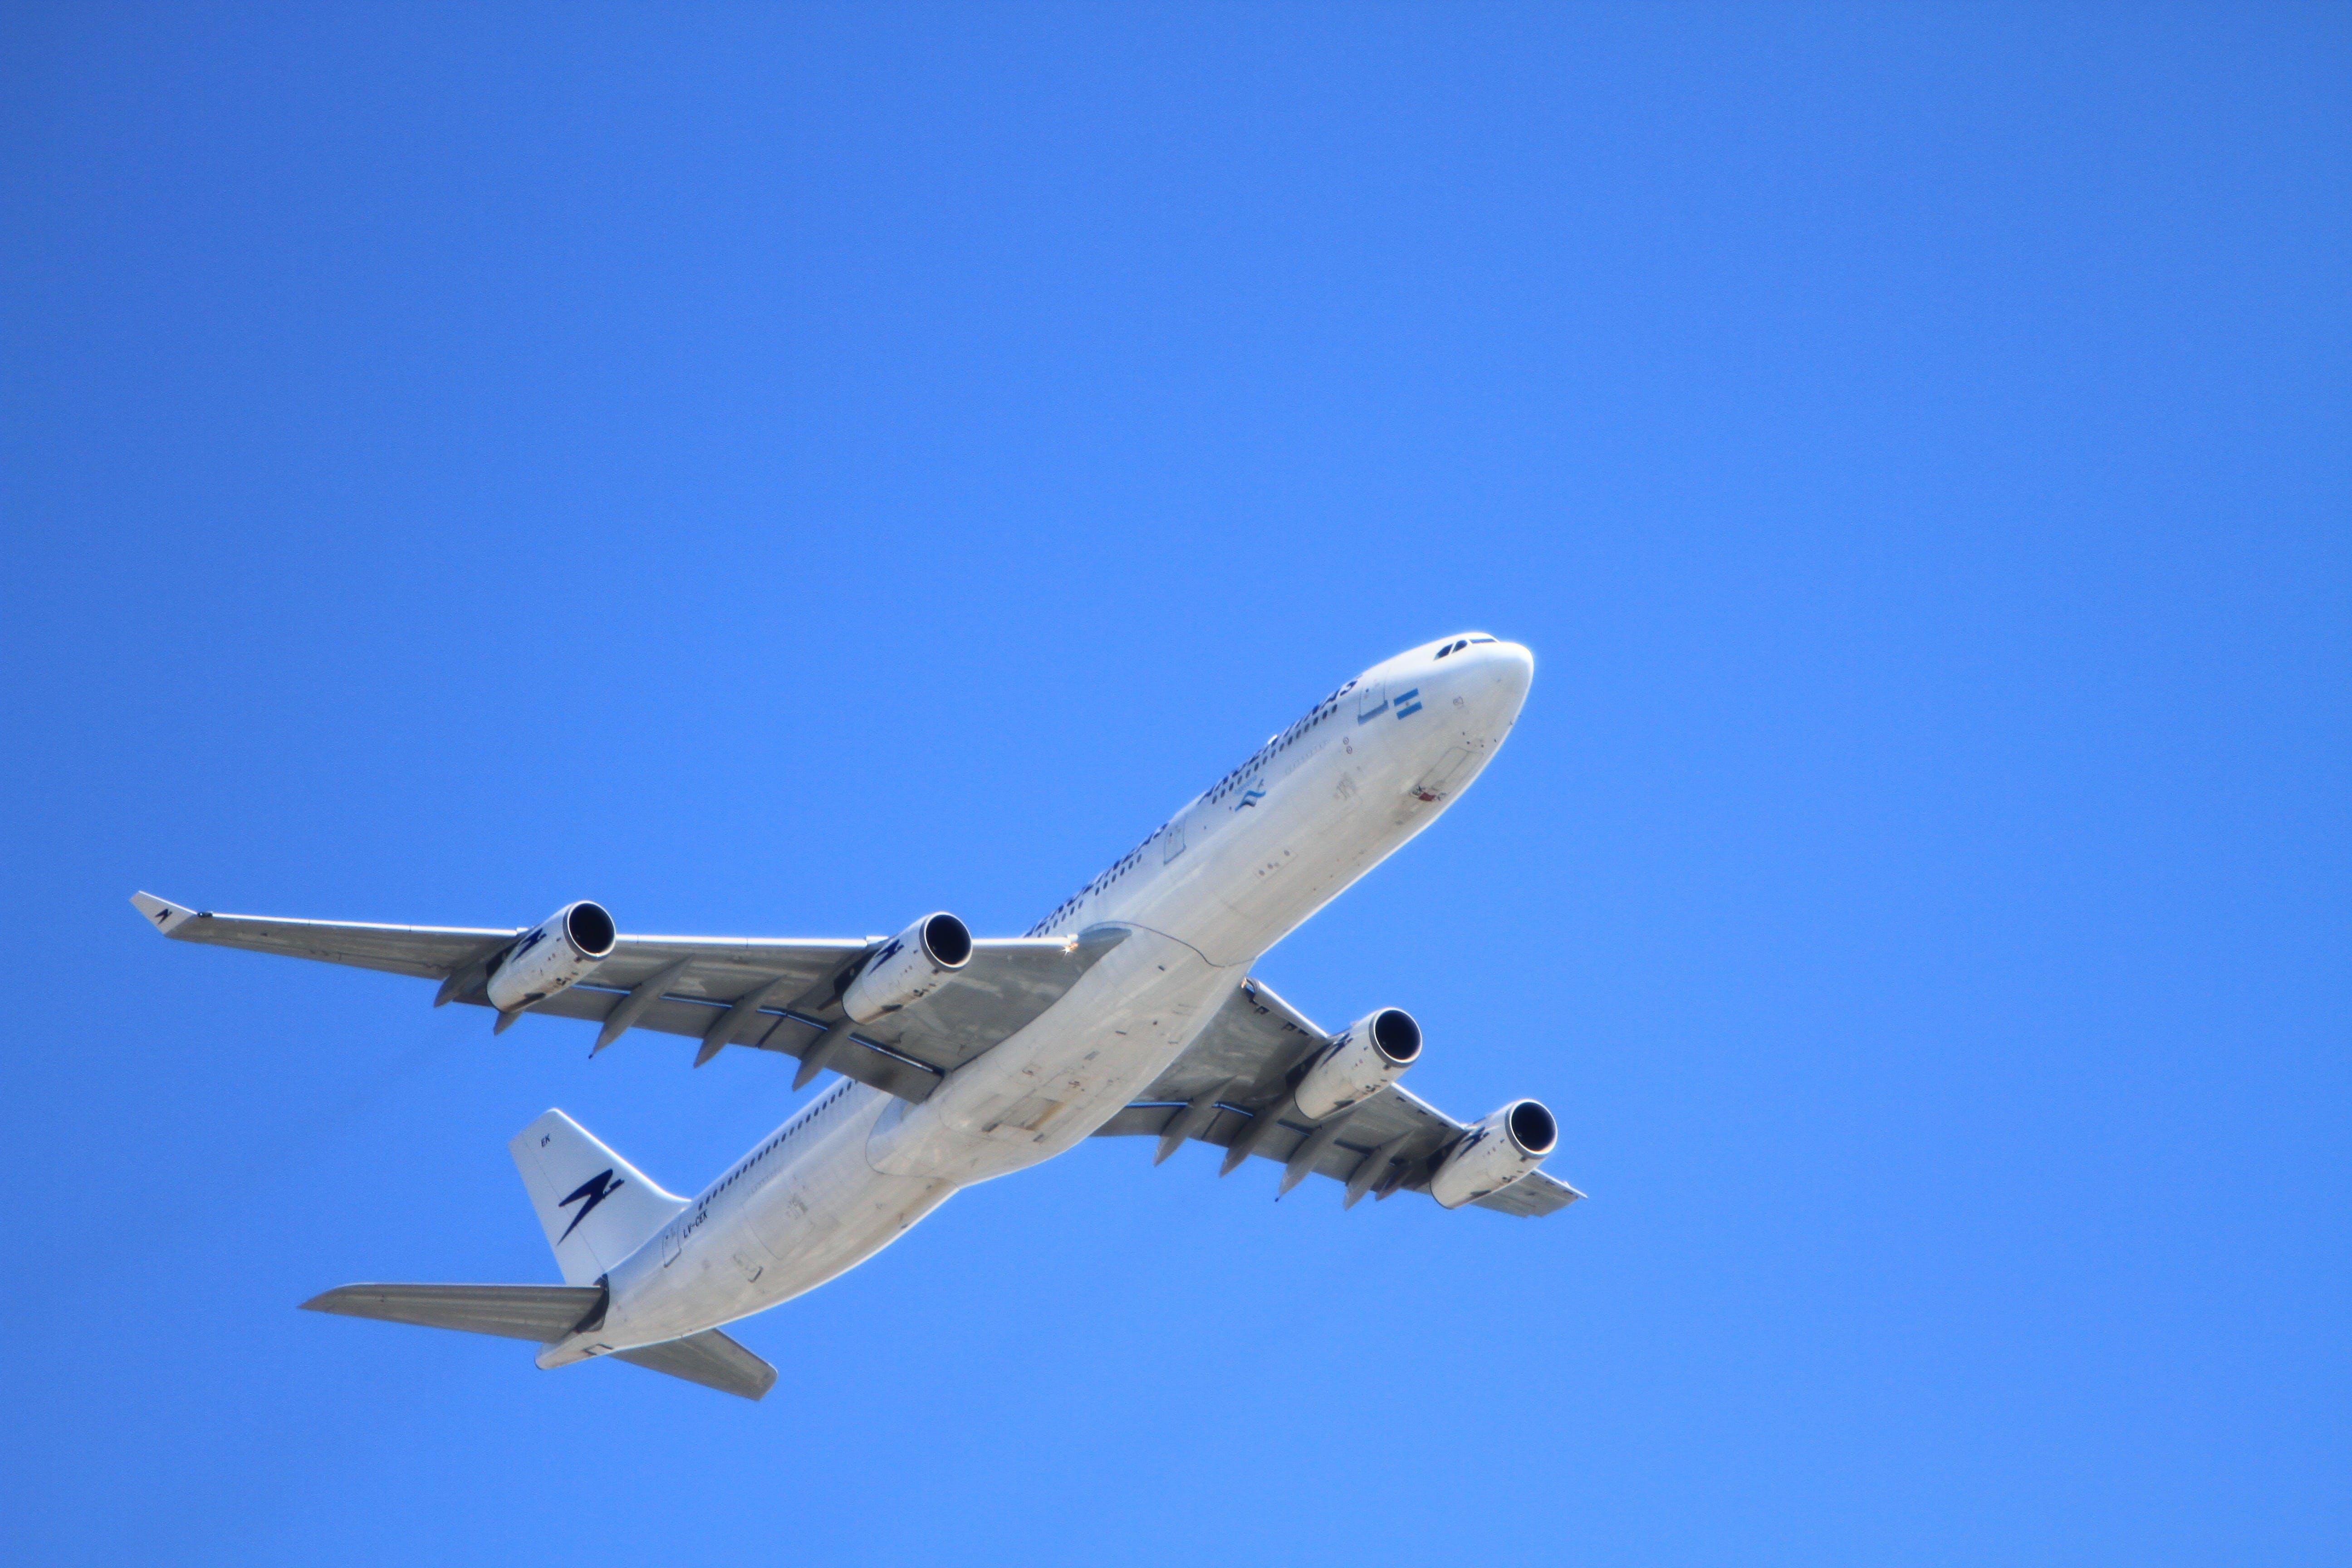 White Passenger Plane Flying on Sky during Day Time